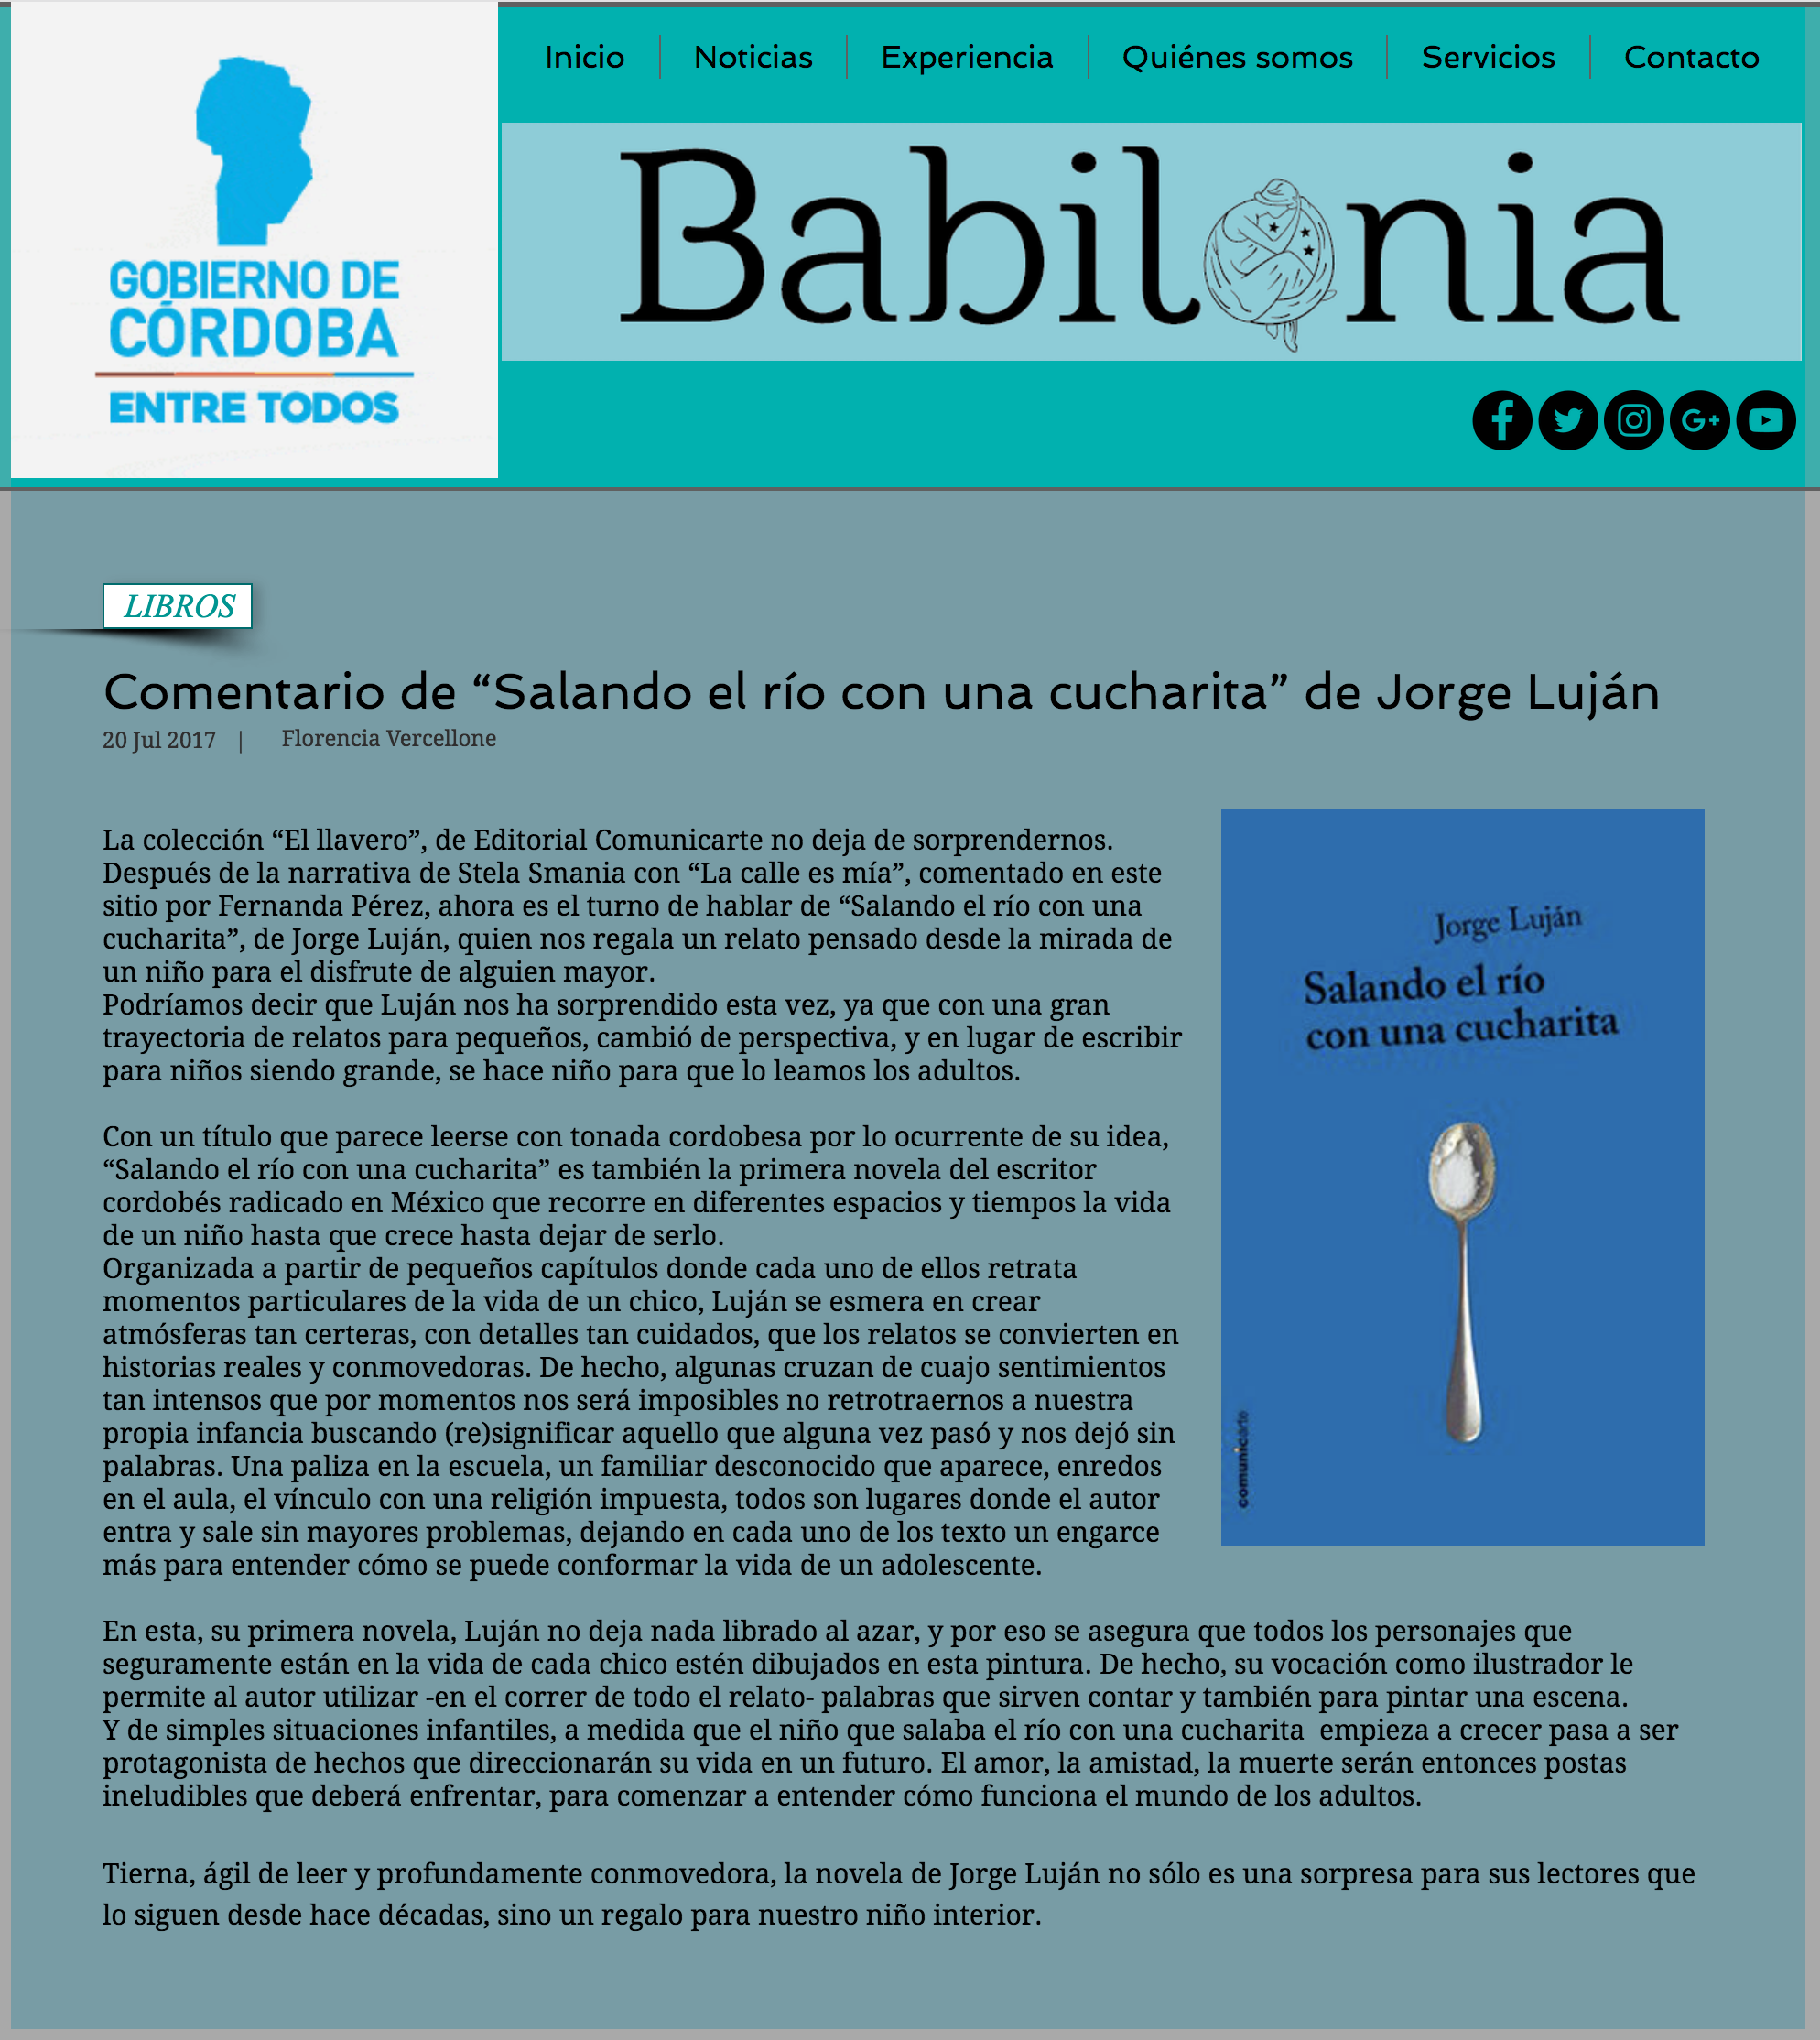 Jorge Luján nota en babilonialiteraria.com